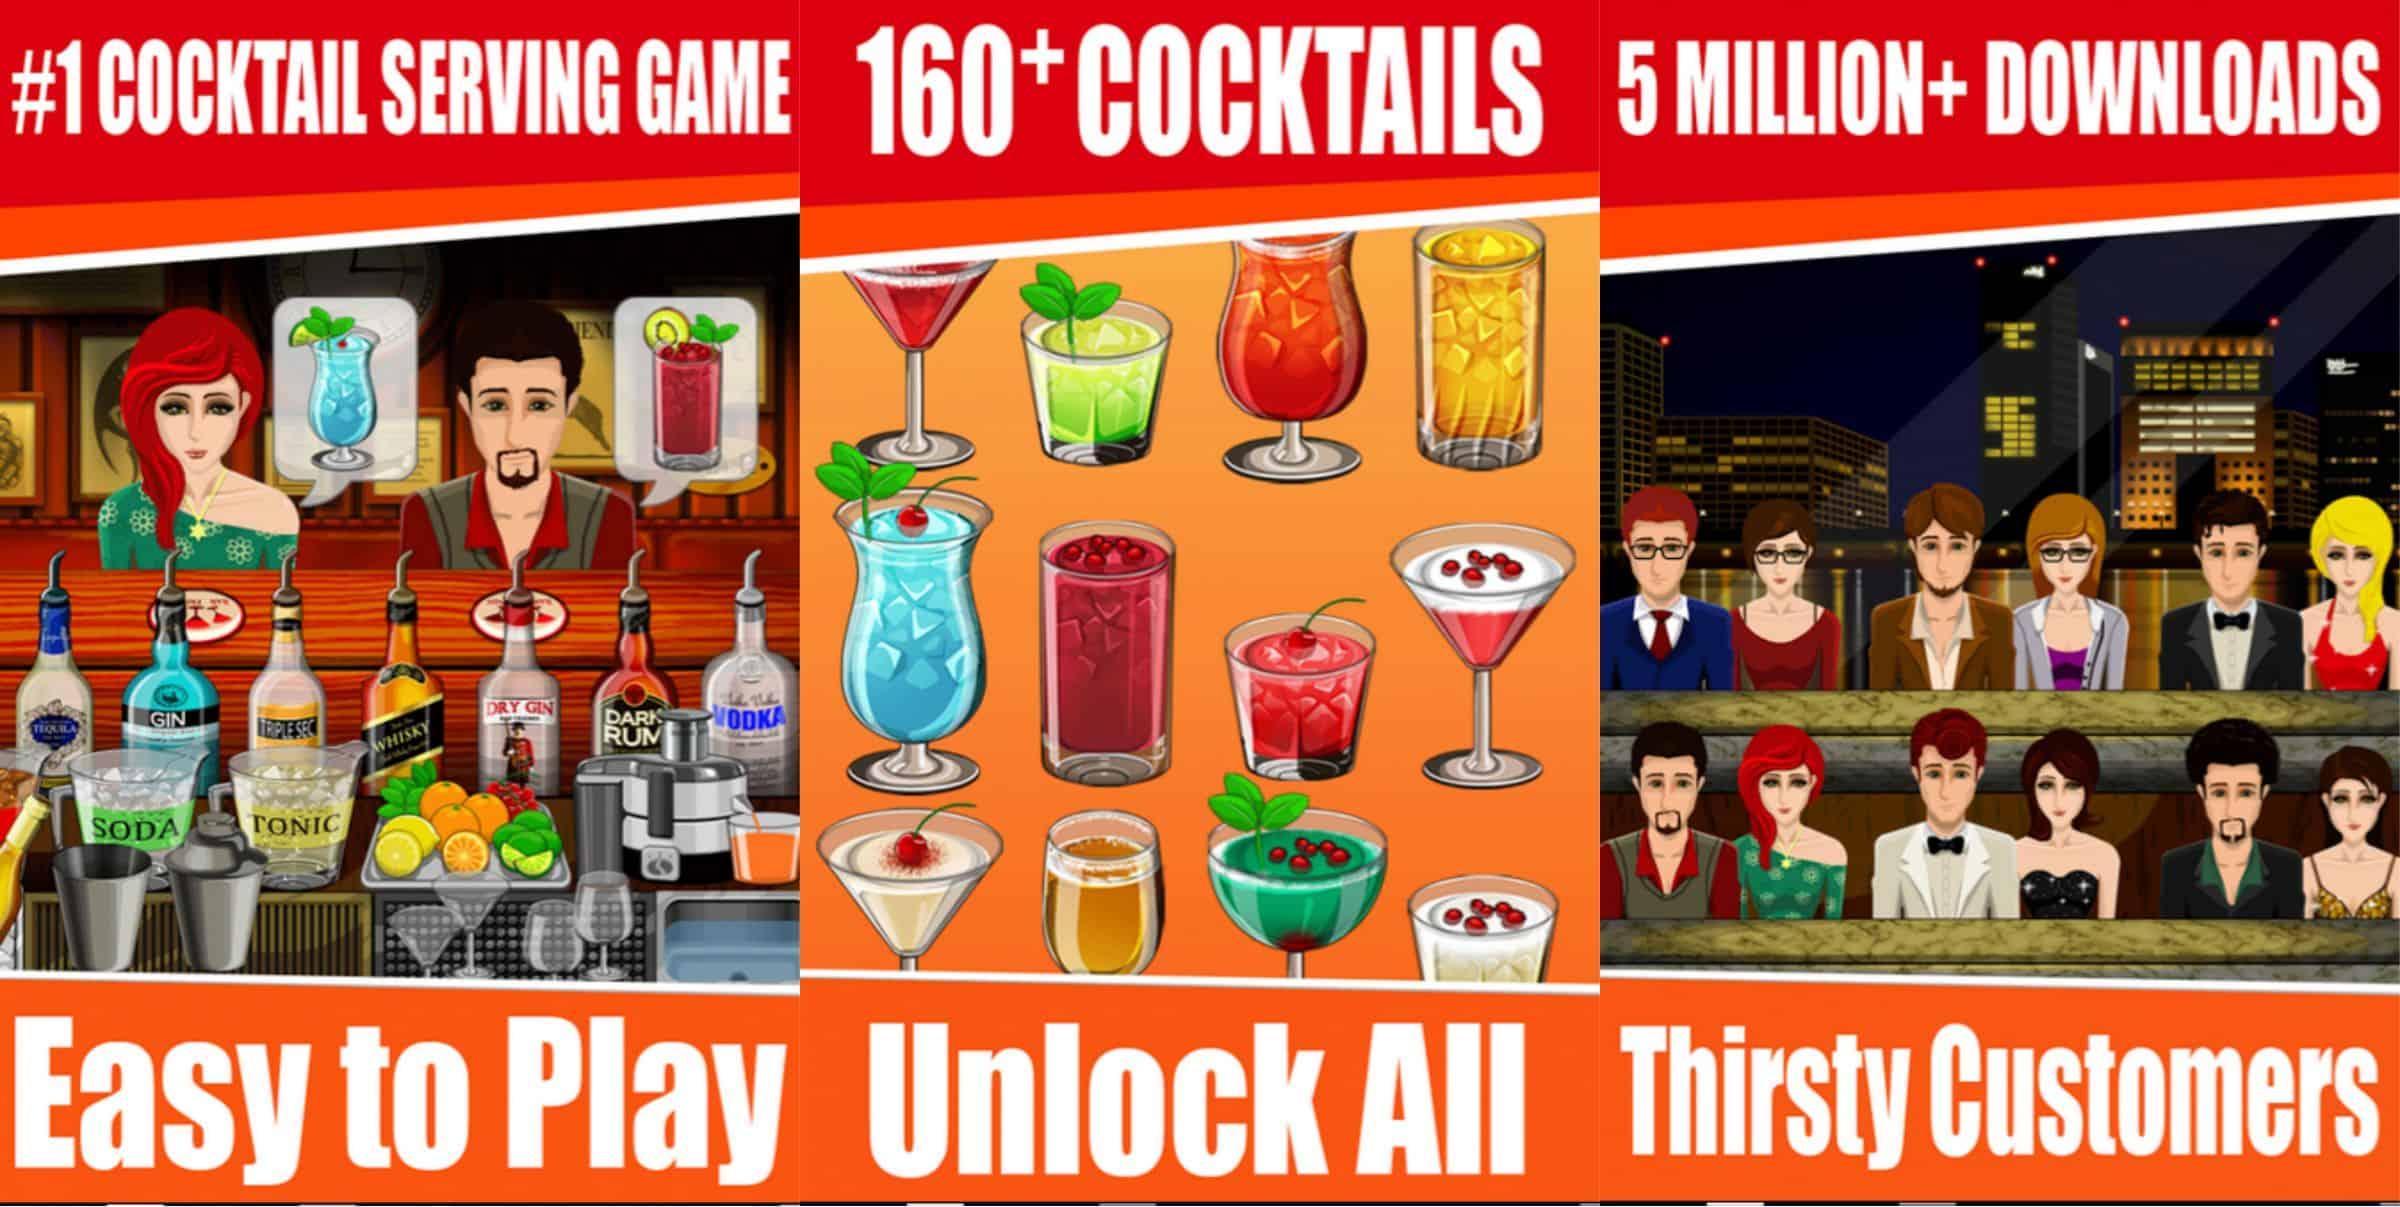 CocktailGame